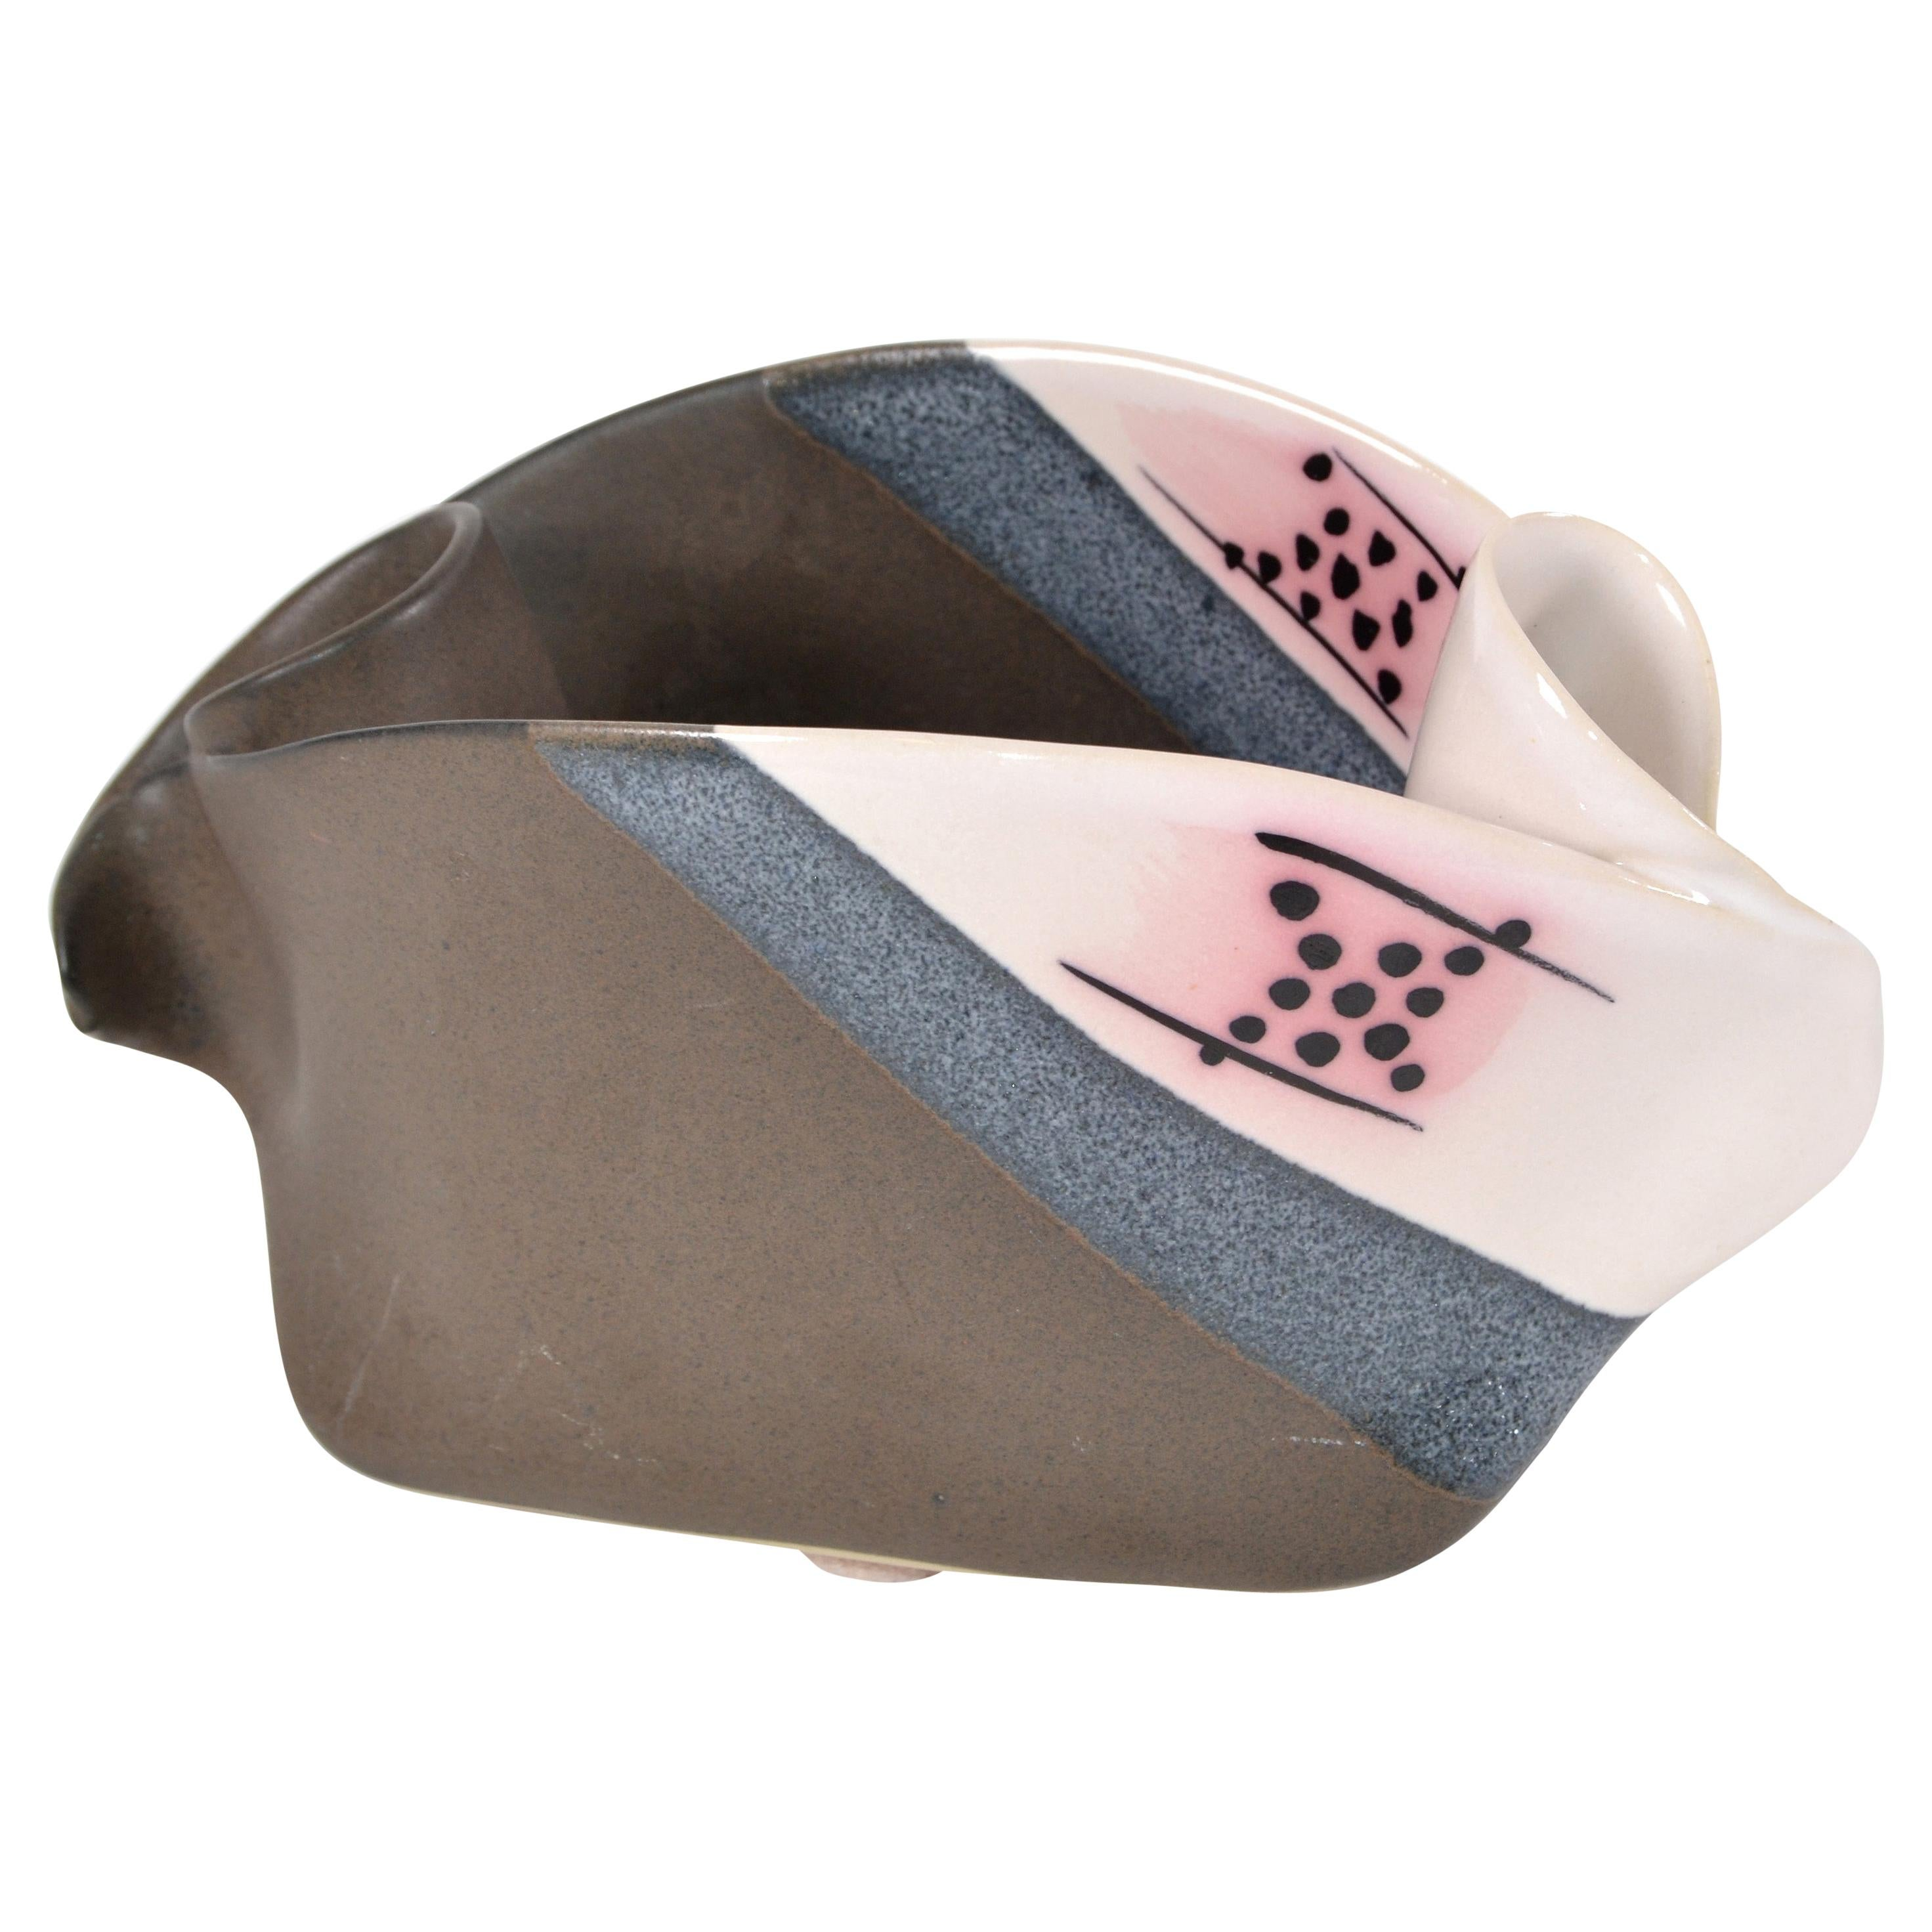 1970 Canadian Freeform Glazed Ceramic Bowl, Pottery Pink, Black, Blue and Gray